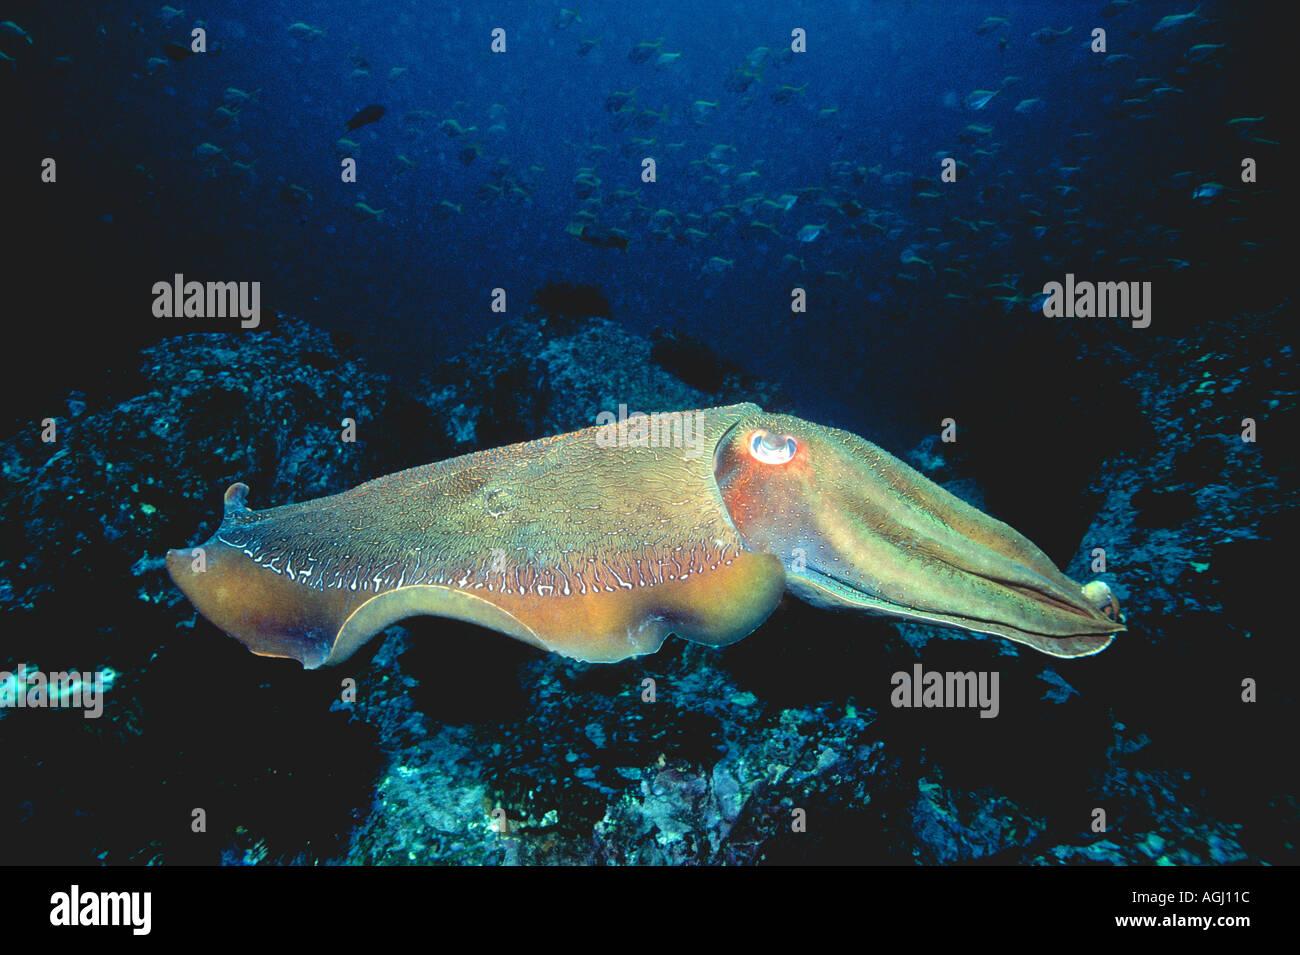 giant-australian-cuttlefish-sepia-apama-AGJ11C.jpg